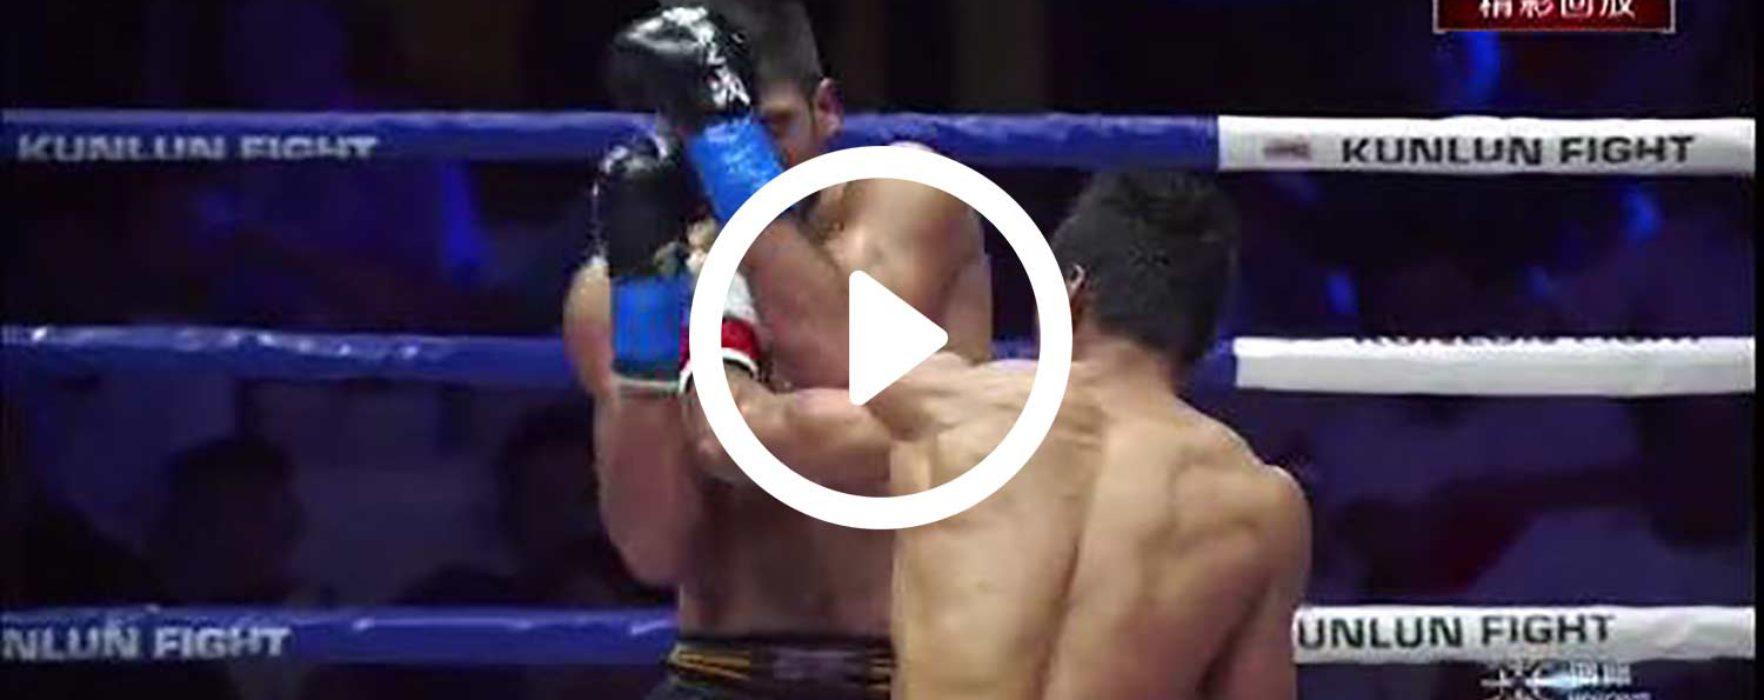 (English) Videos / Results: Kunlun Fight 50 ft. Sitthichai, Kulebin, Jomthong etc – 20/08/2016